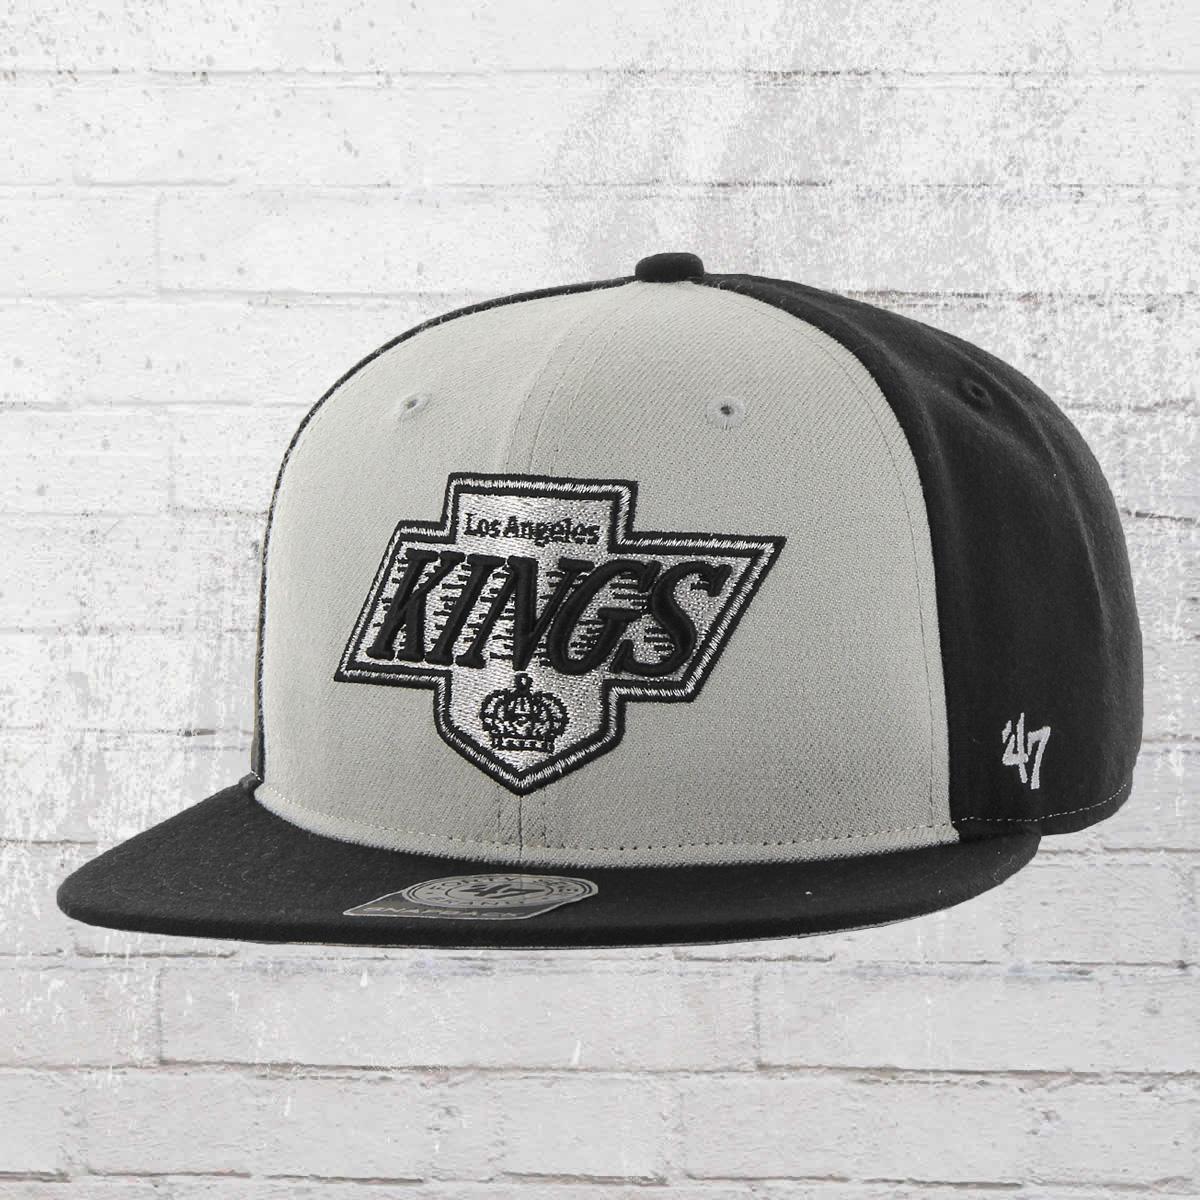 fe8a89a262b 47 Brand Snapback Cap NHL Los Angeles Kings Hat black grey